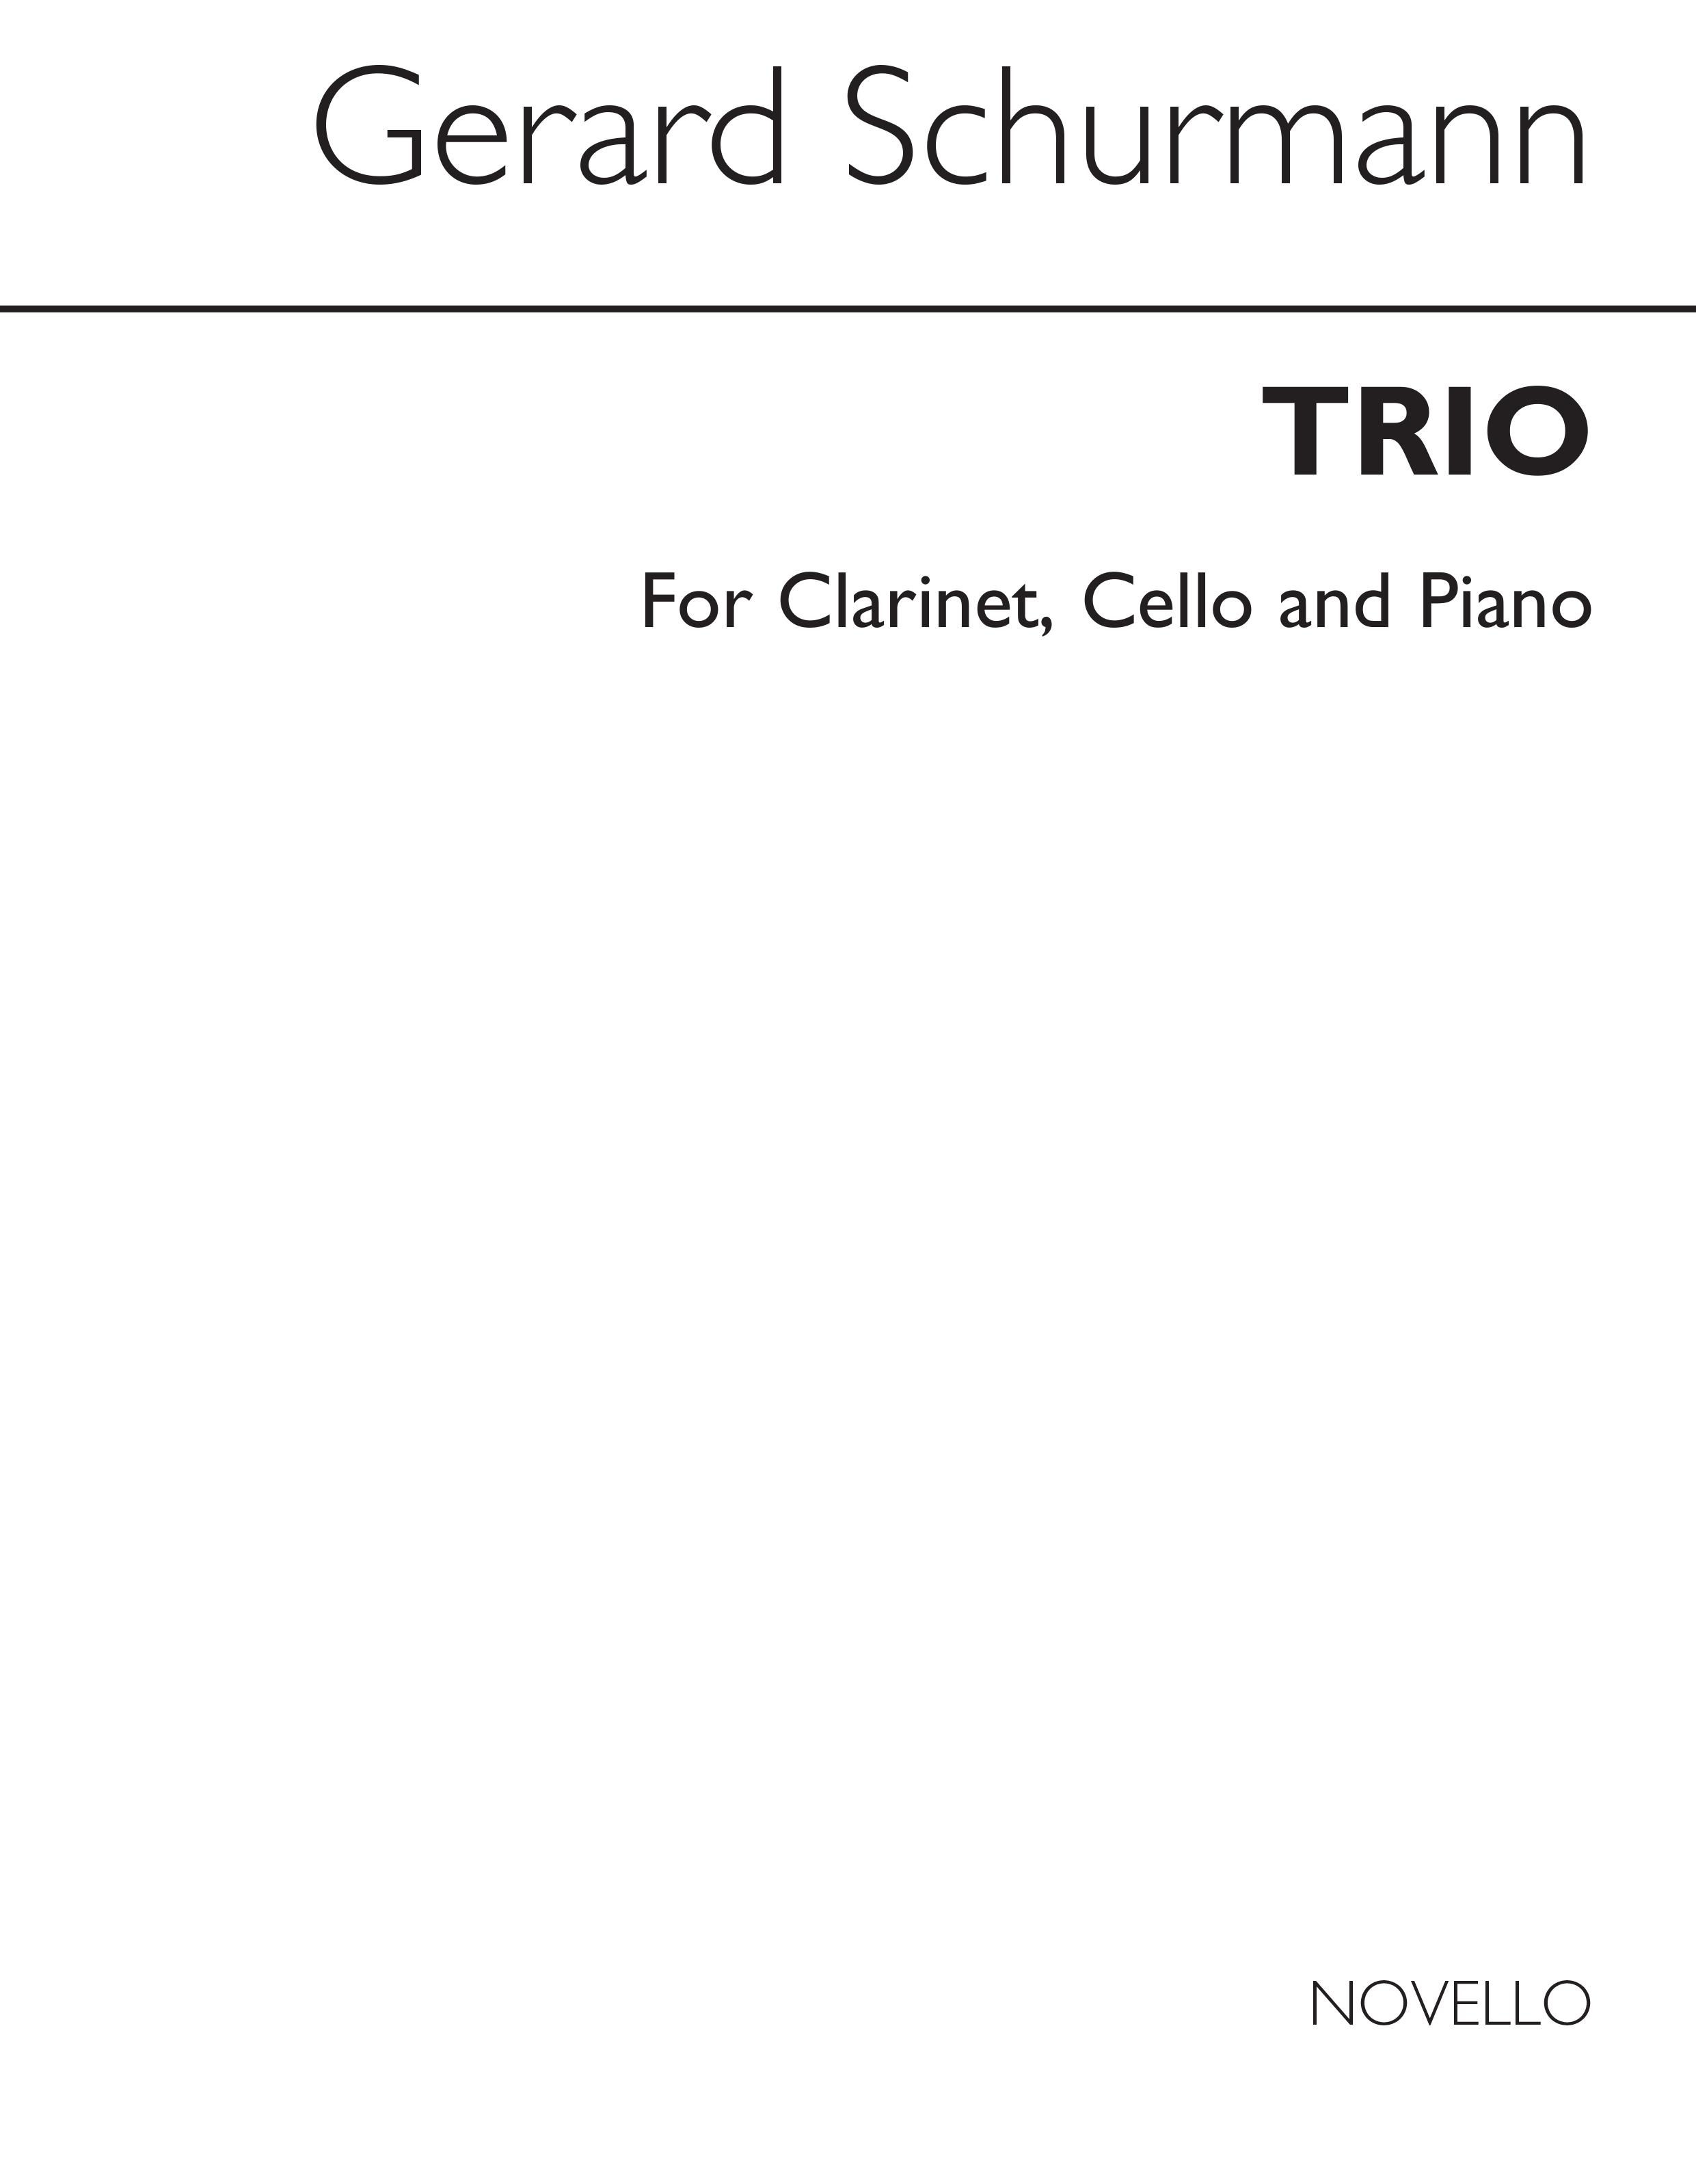 Gerard Schurmann: G Trio Clarinet And Cello And Piano: Chamber Ensemble: